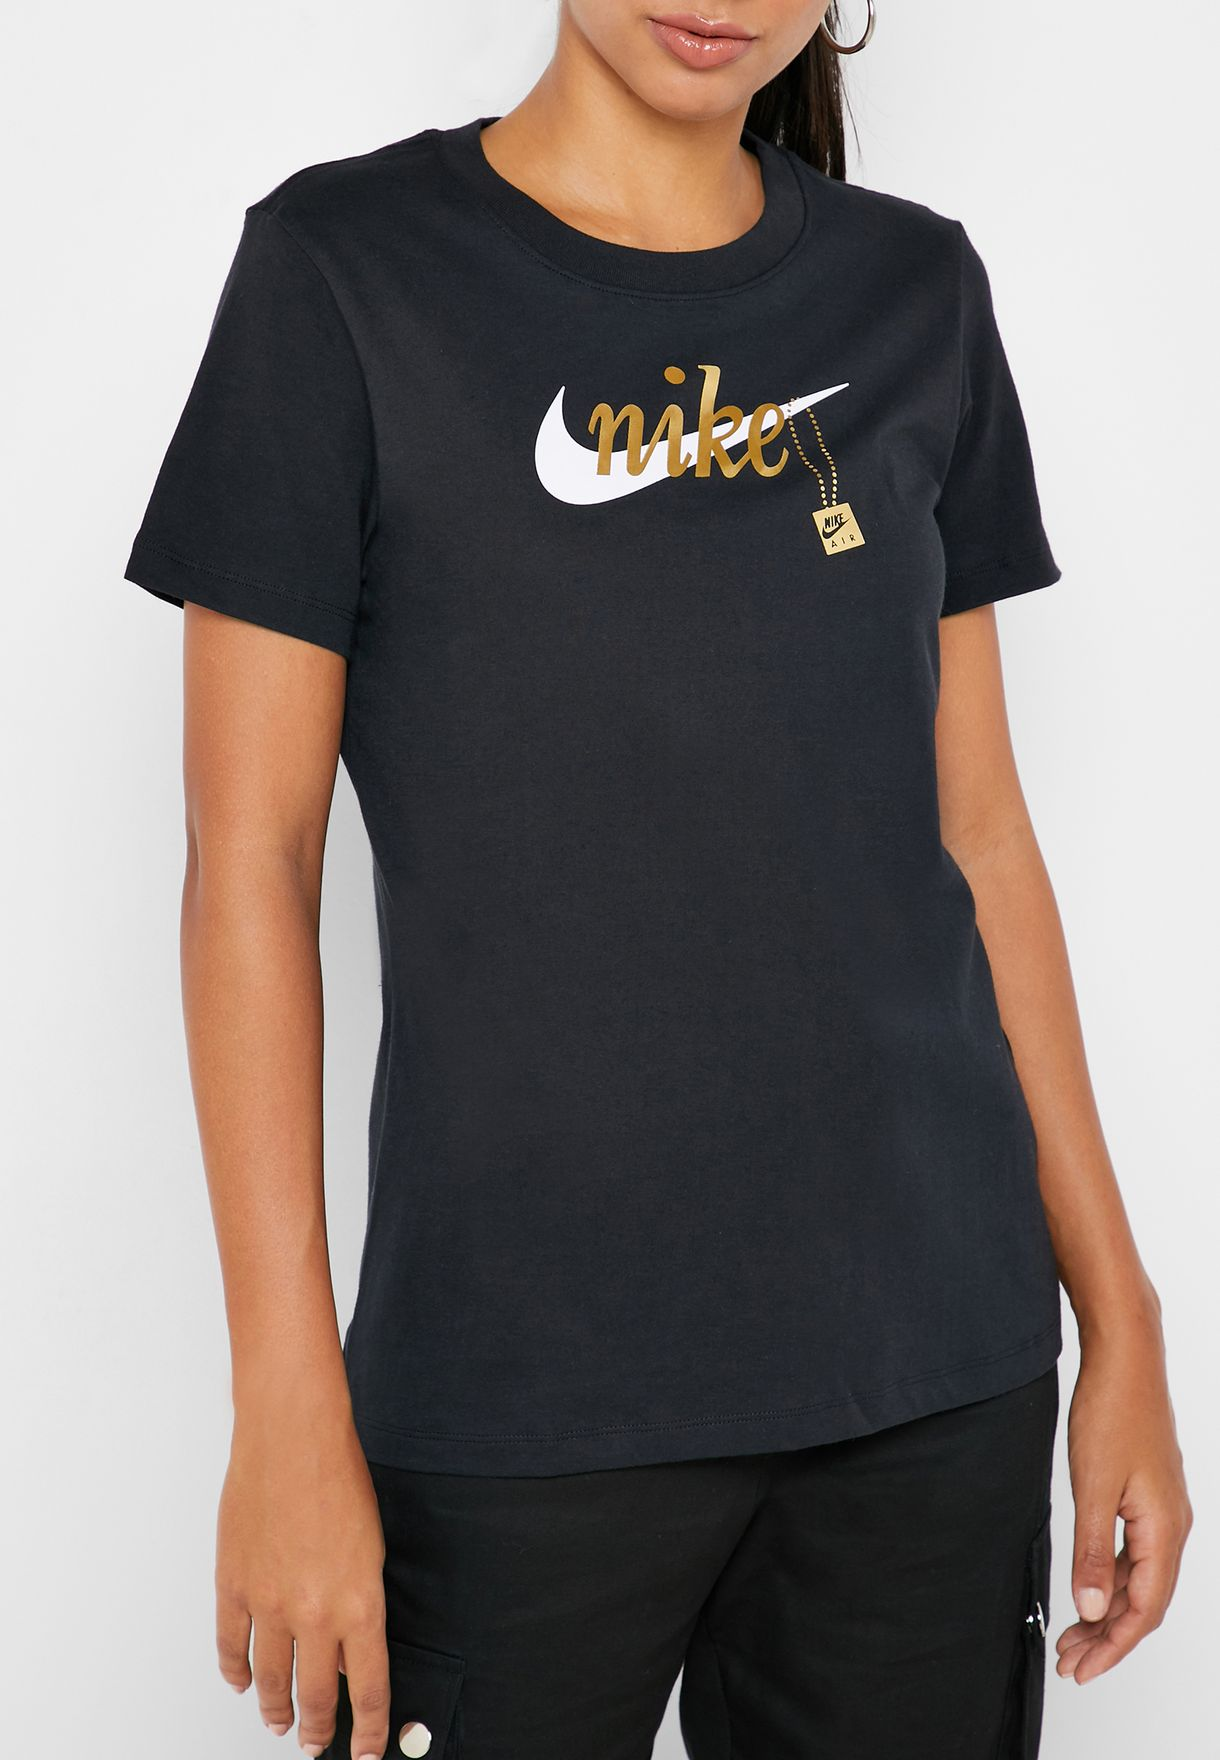 NSW Sport Charm T-Shirt